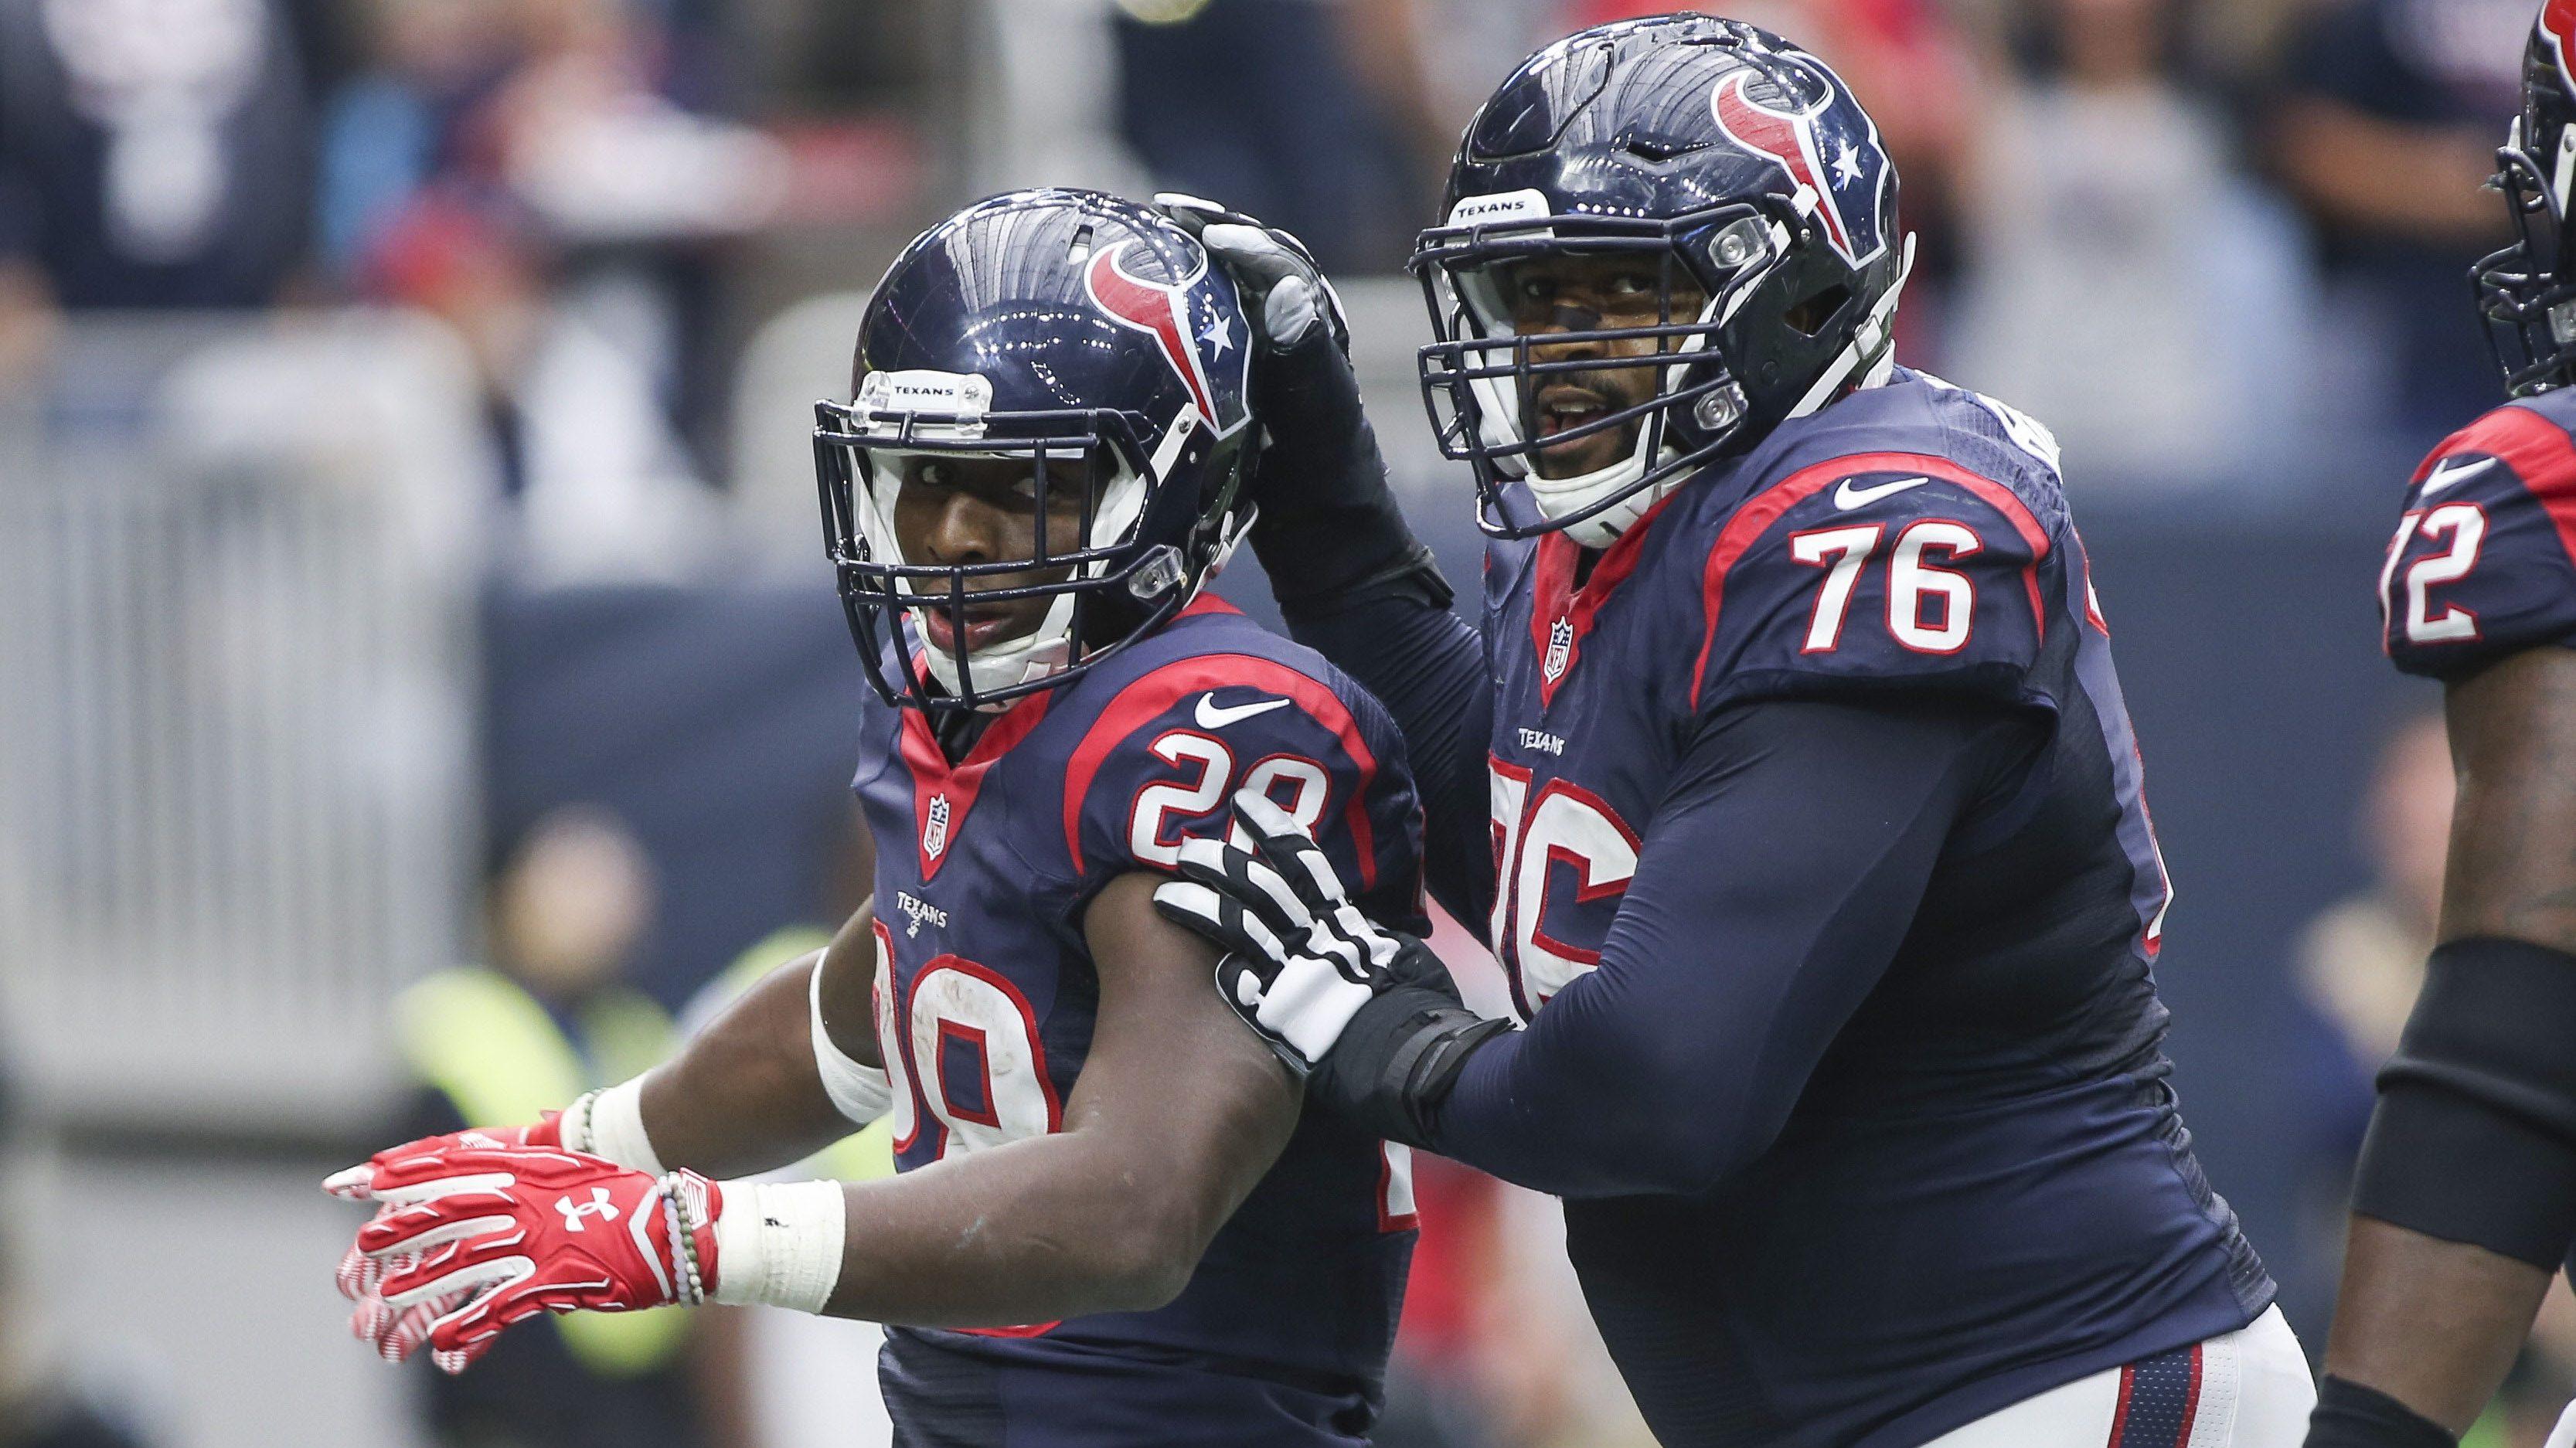 NFL: New York Jets at Houston Texans